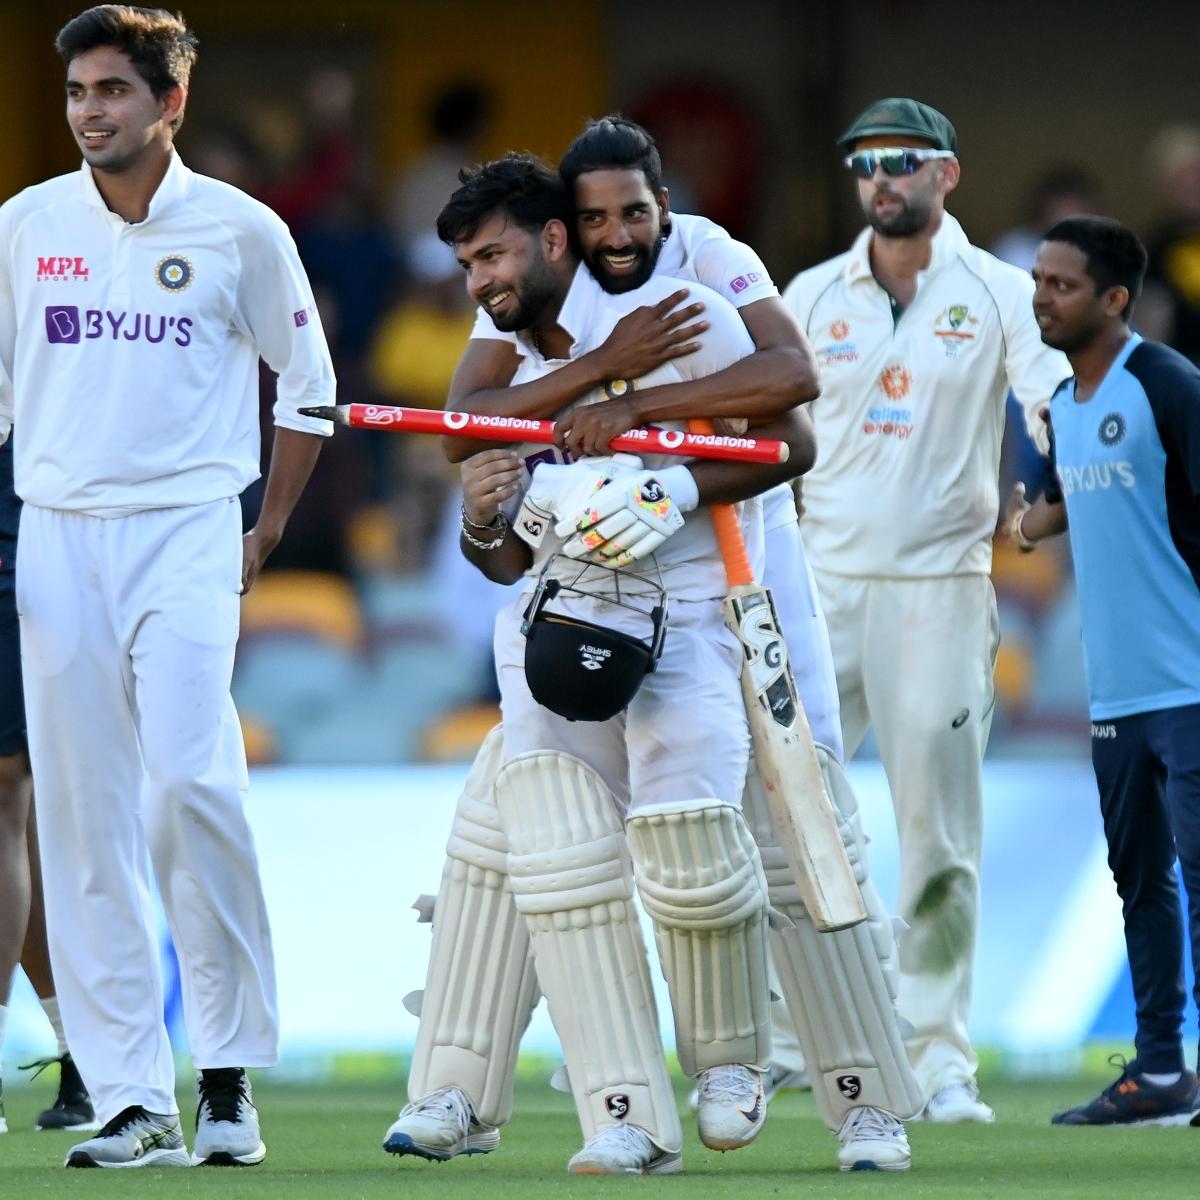 India retains Border-Gavaskar trophy with historic 2-1 win against Australia in Test series